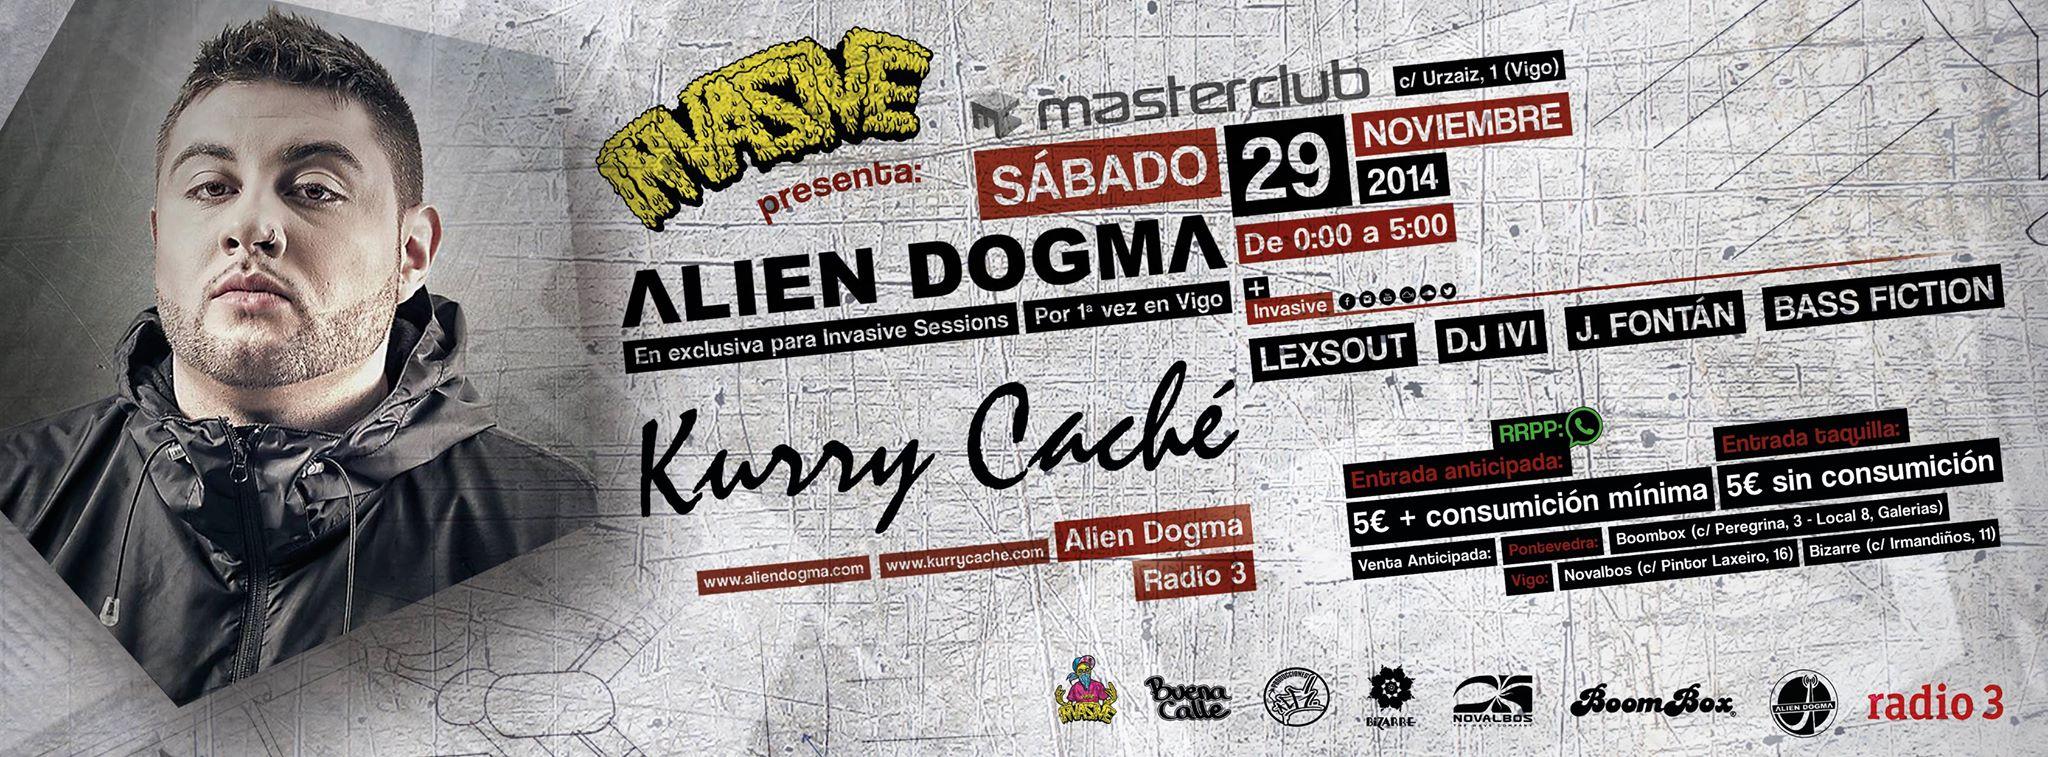 Invasive presenta Kurry Cache Alien Dogma